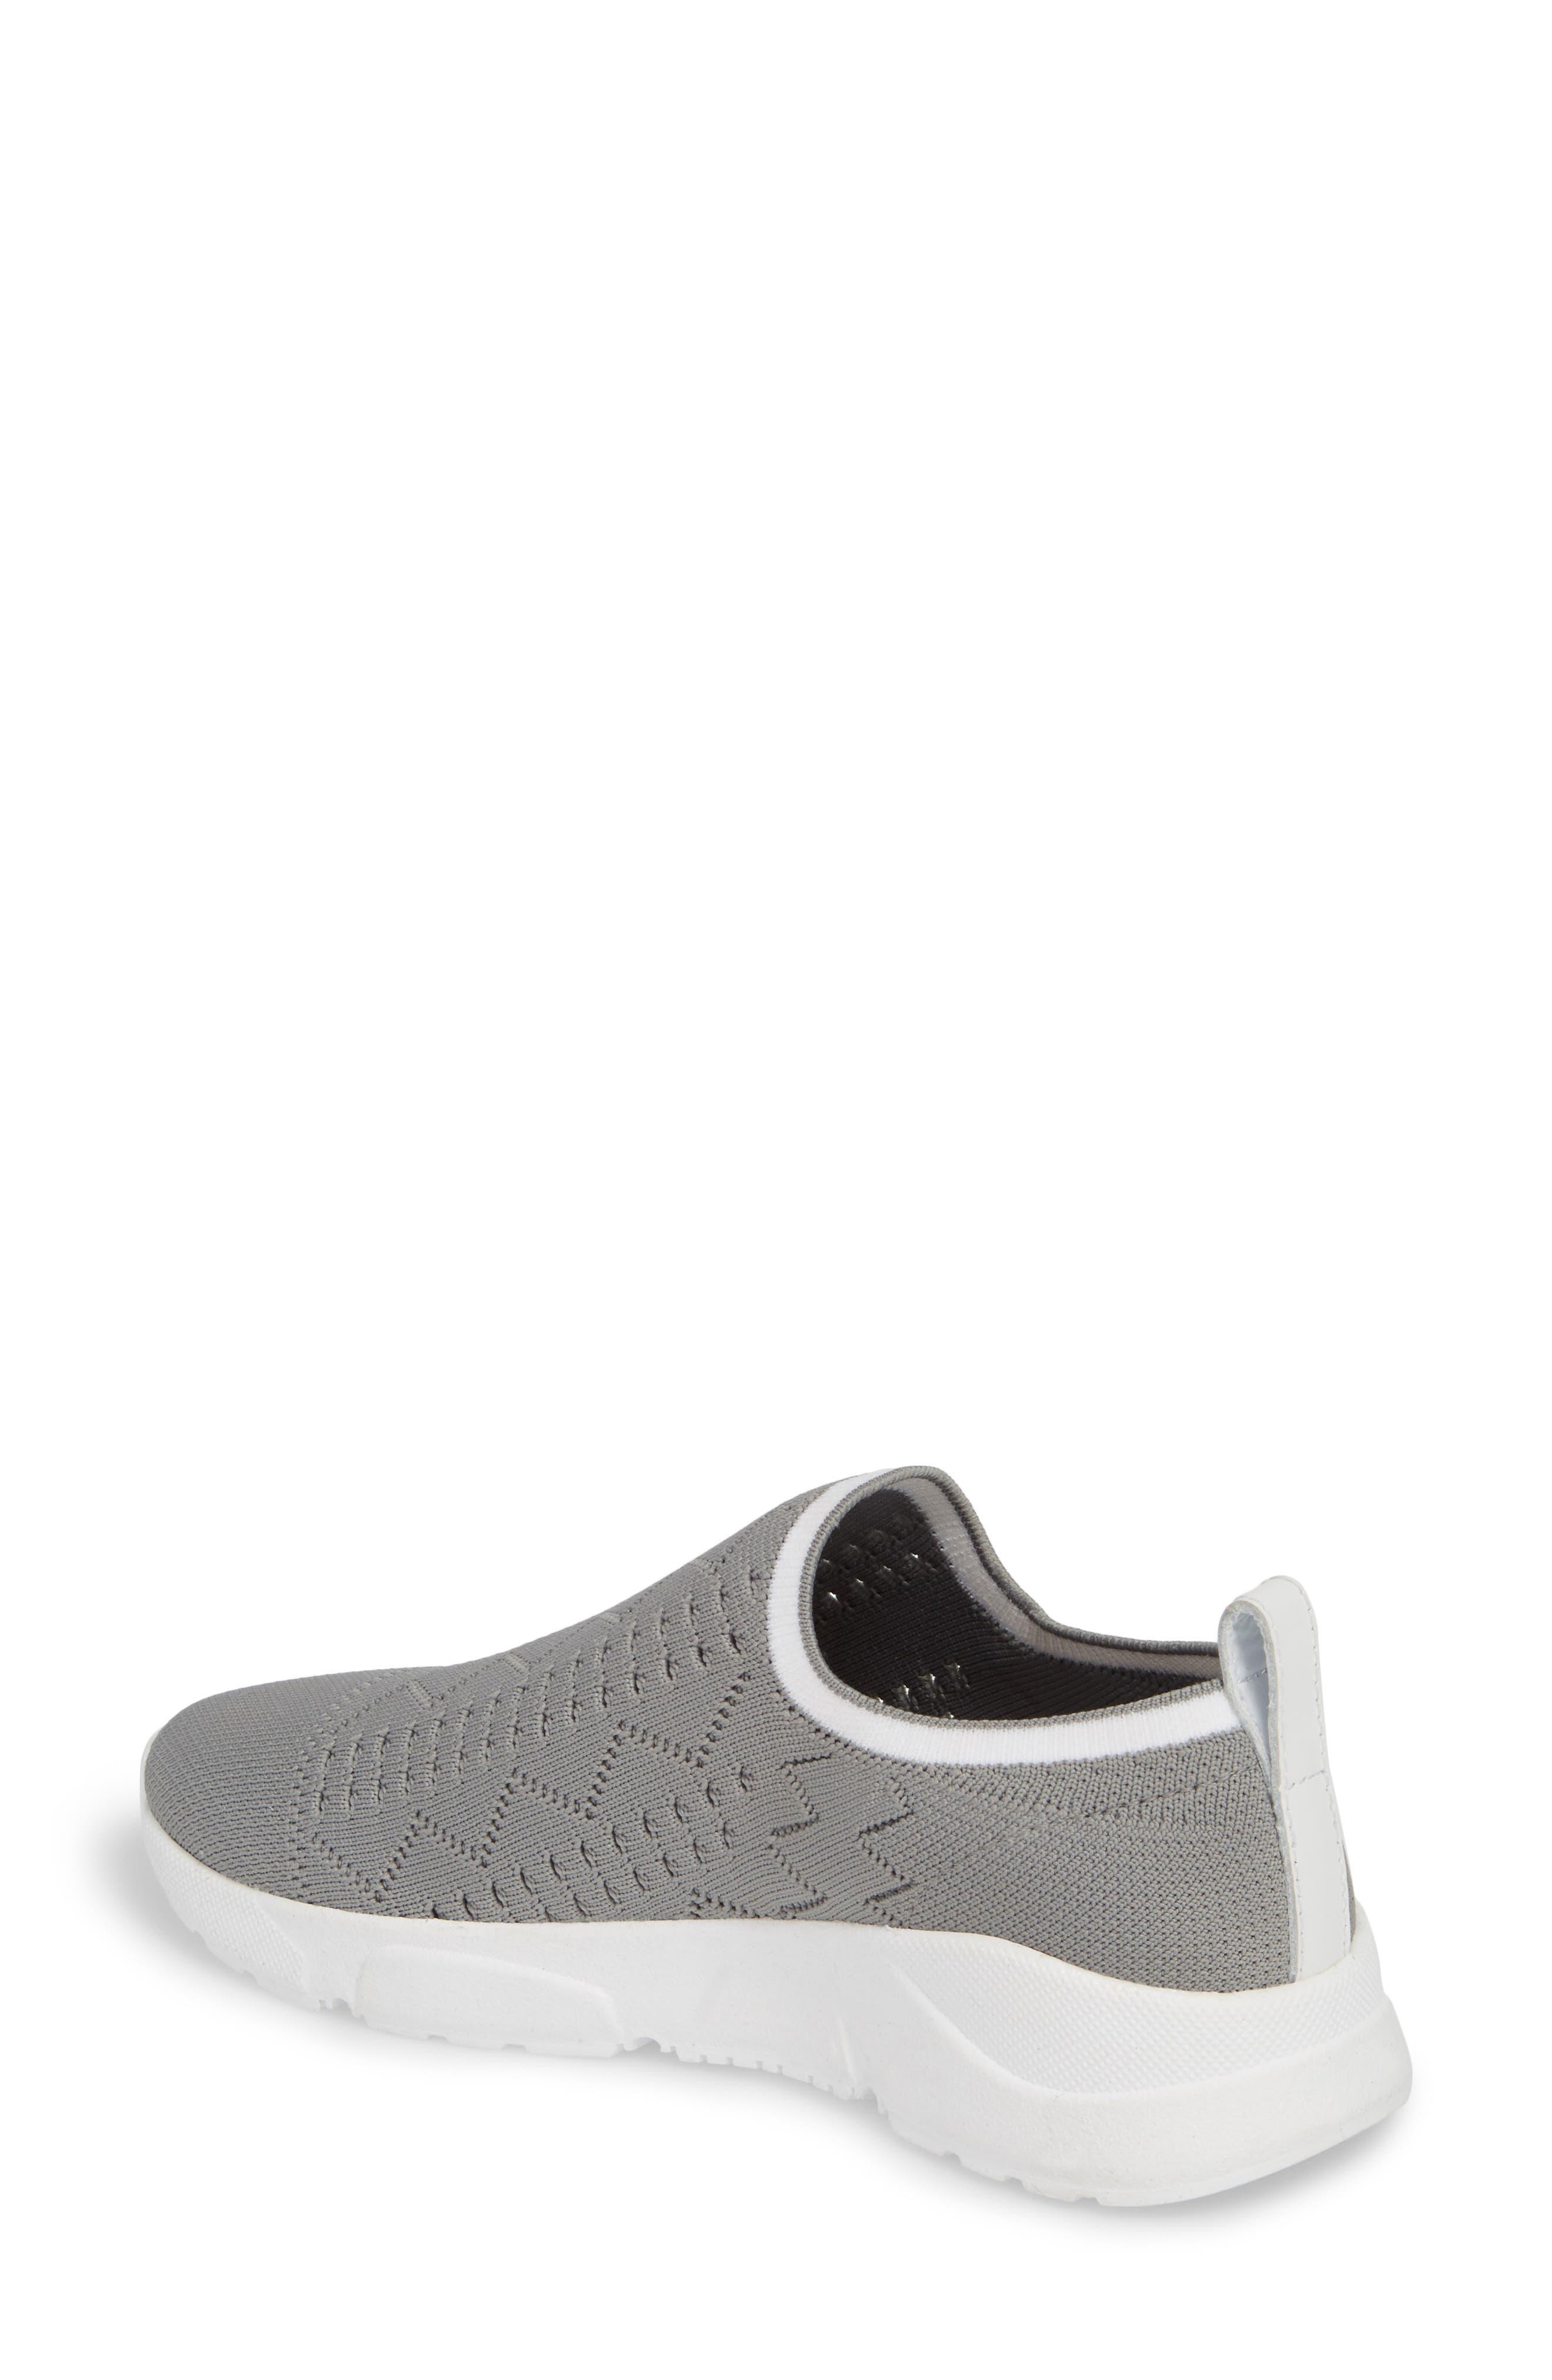 Karrie Slip-On Sneaker,                             Alternate thumbnail 2, color,                             Grey Stretch Fabric